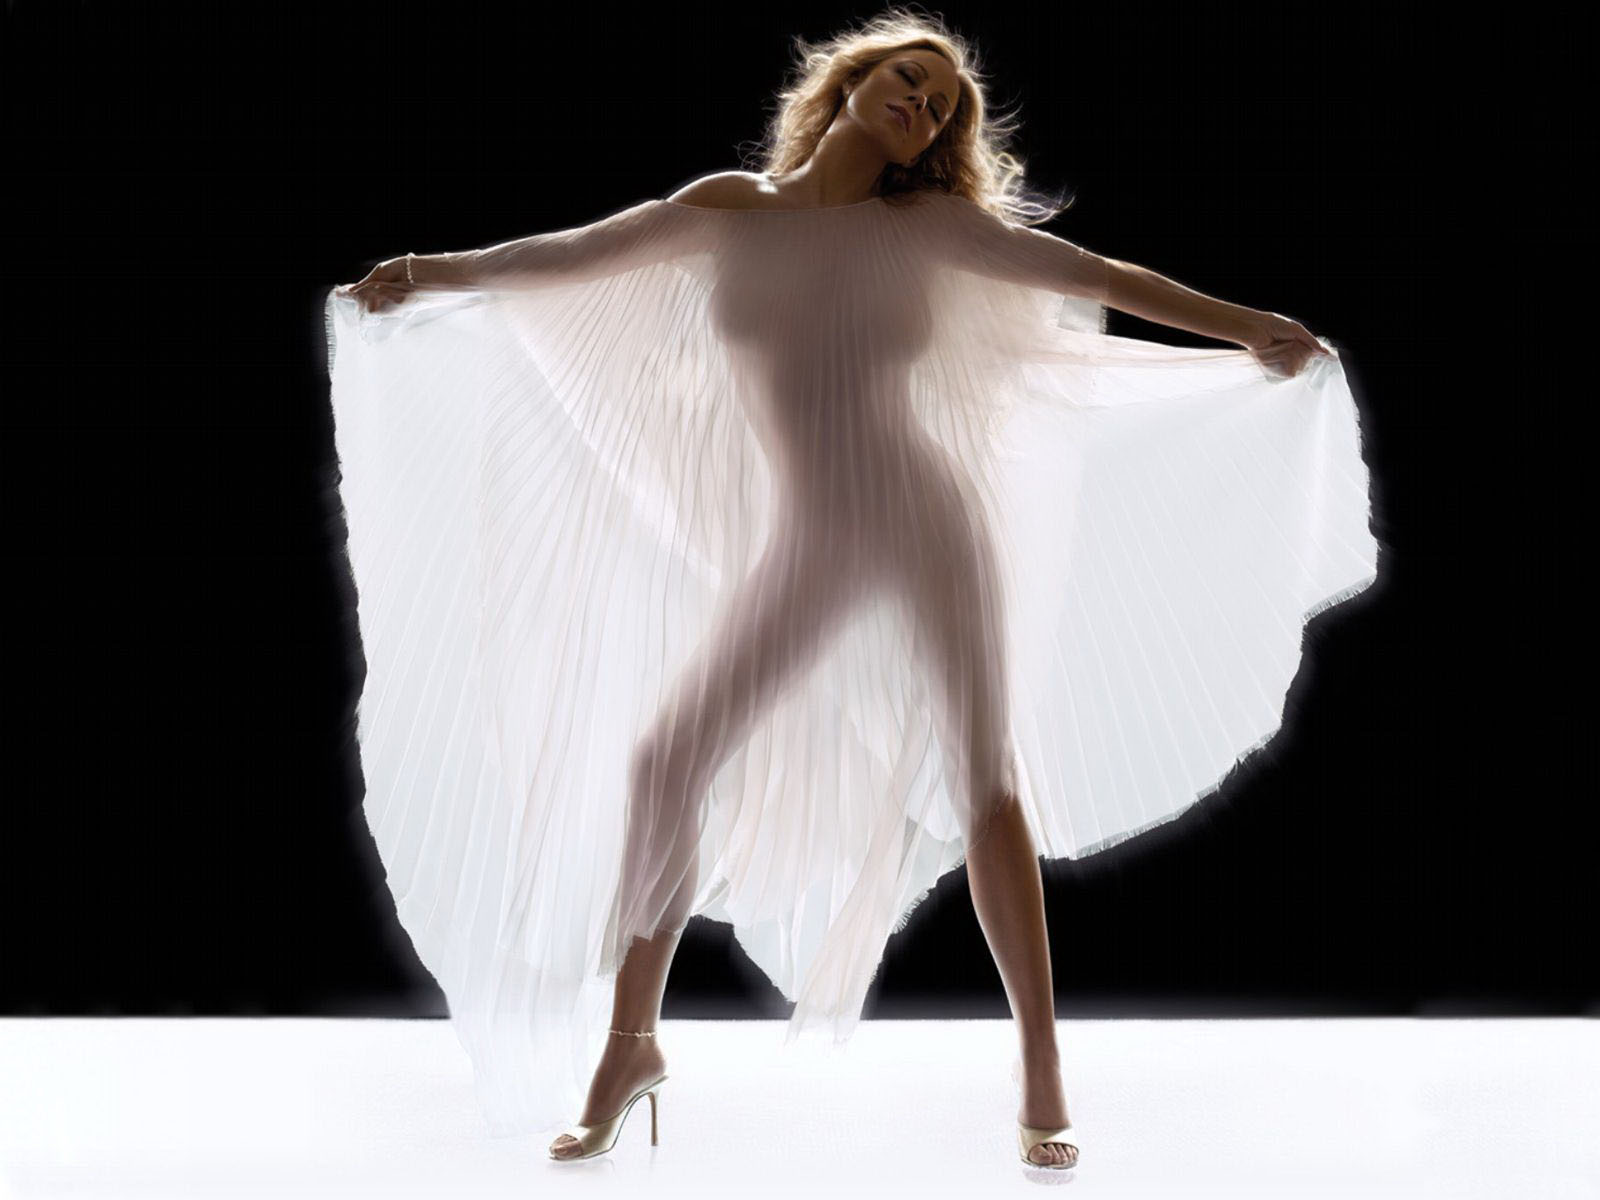 http://3.bp.blogspot.com/-YISn9ws7248/Txq4LqP2KeI/AAAAAAAADg4/TbGNfKJL3wM/s1600/Mariah-Carey-015.jpg